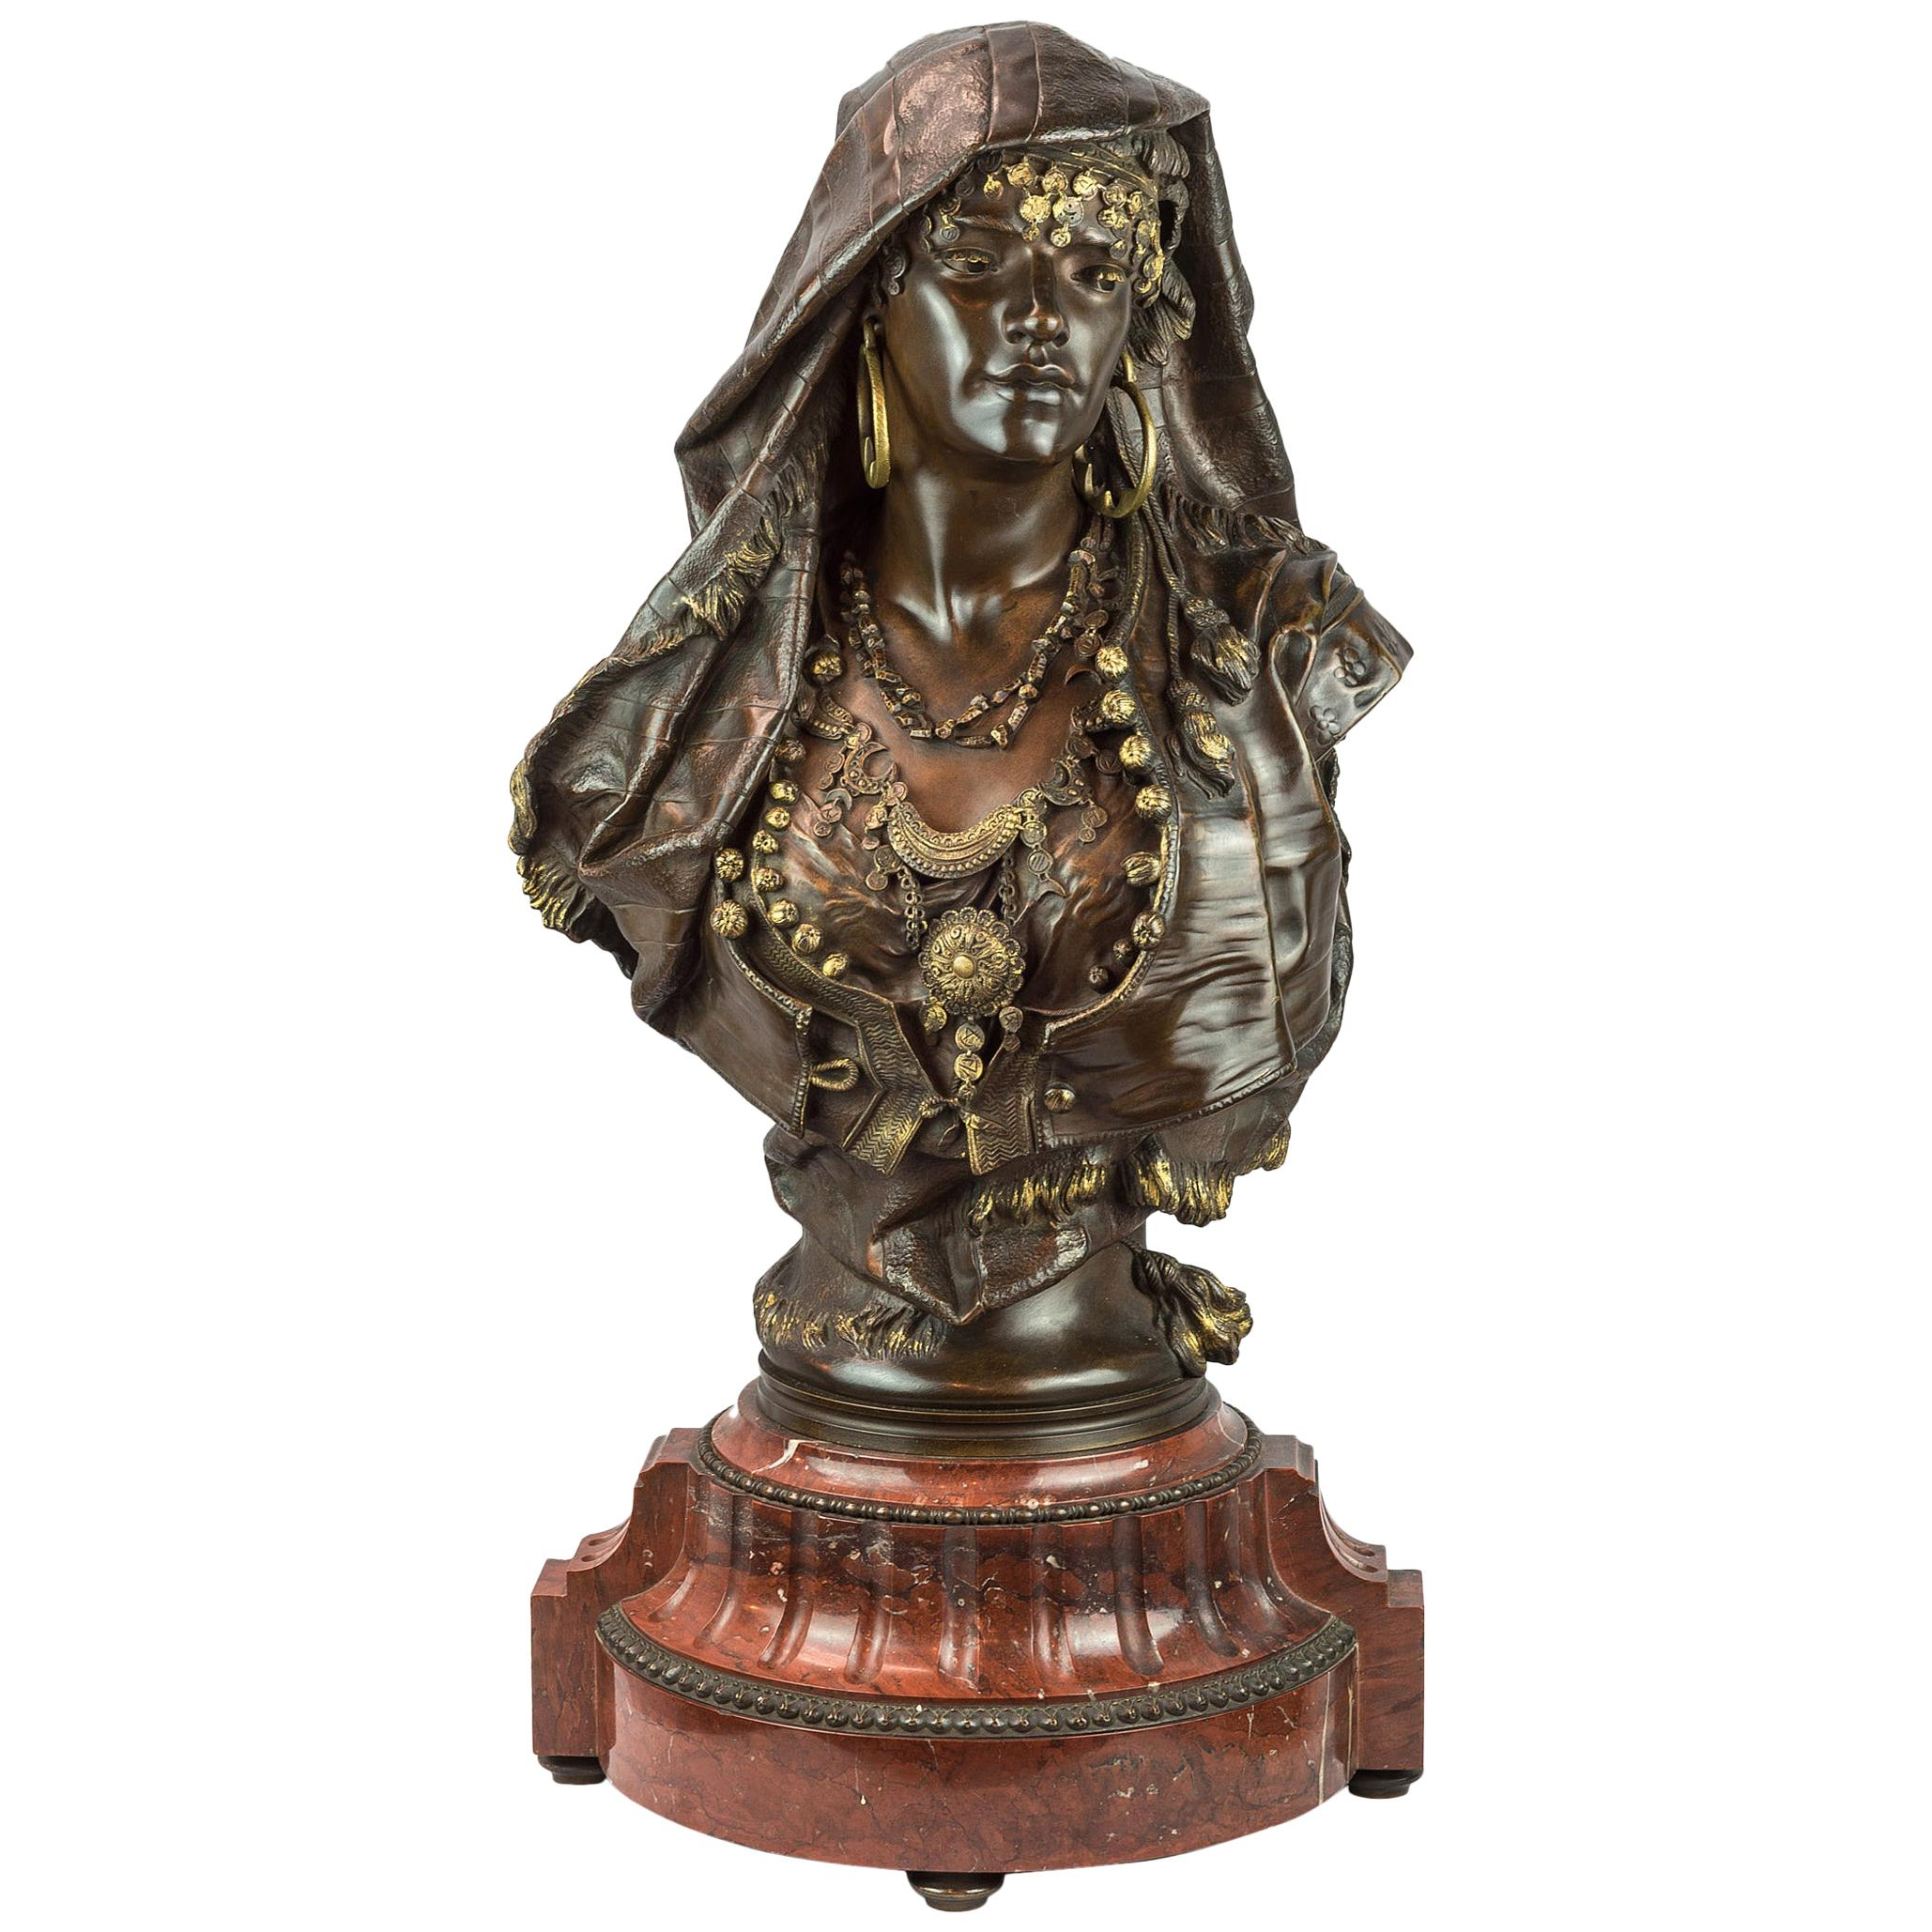 19th Century Orientalist Patinated and Gilt Bronze Bust by Henri-Honoré Plé